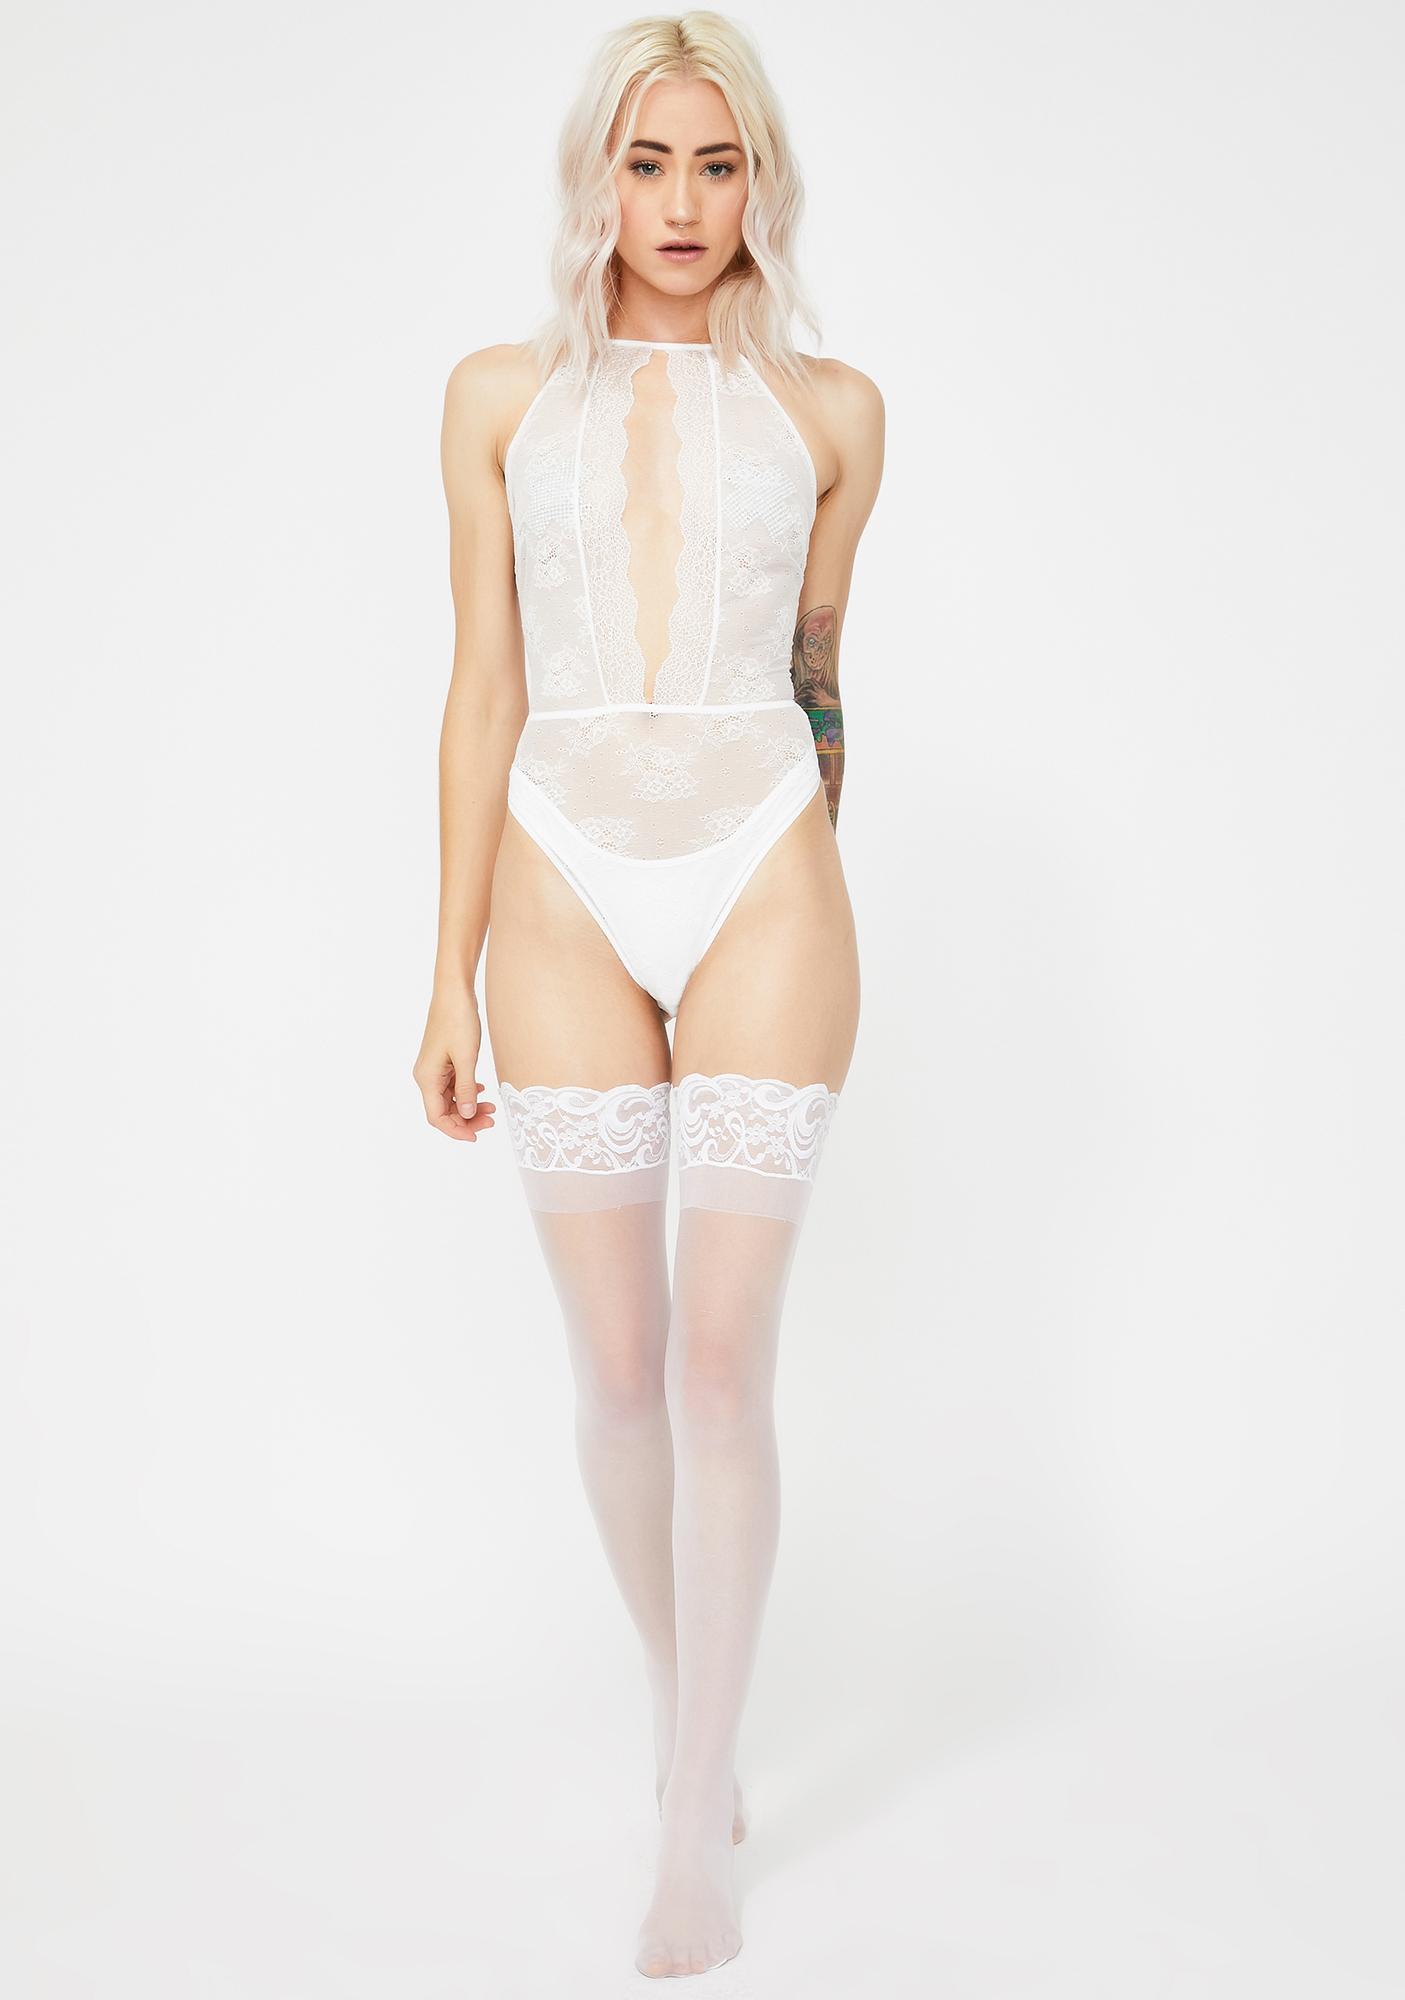 Momokrom Lace Halter Cut Out Bodysuit